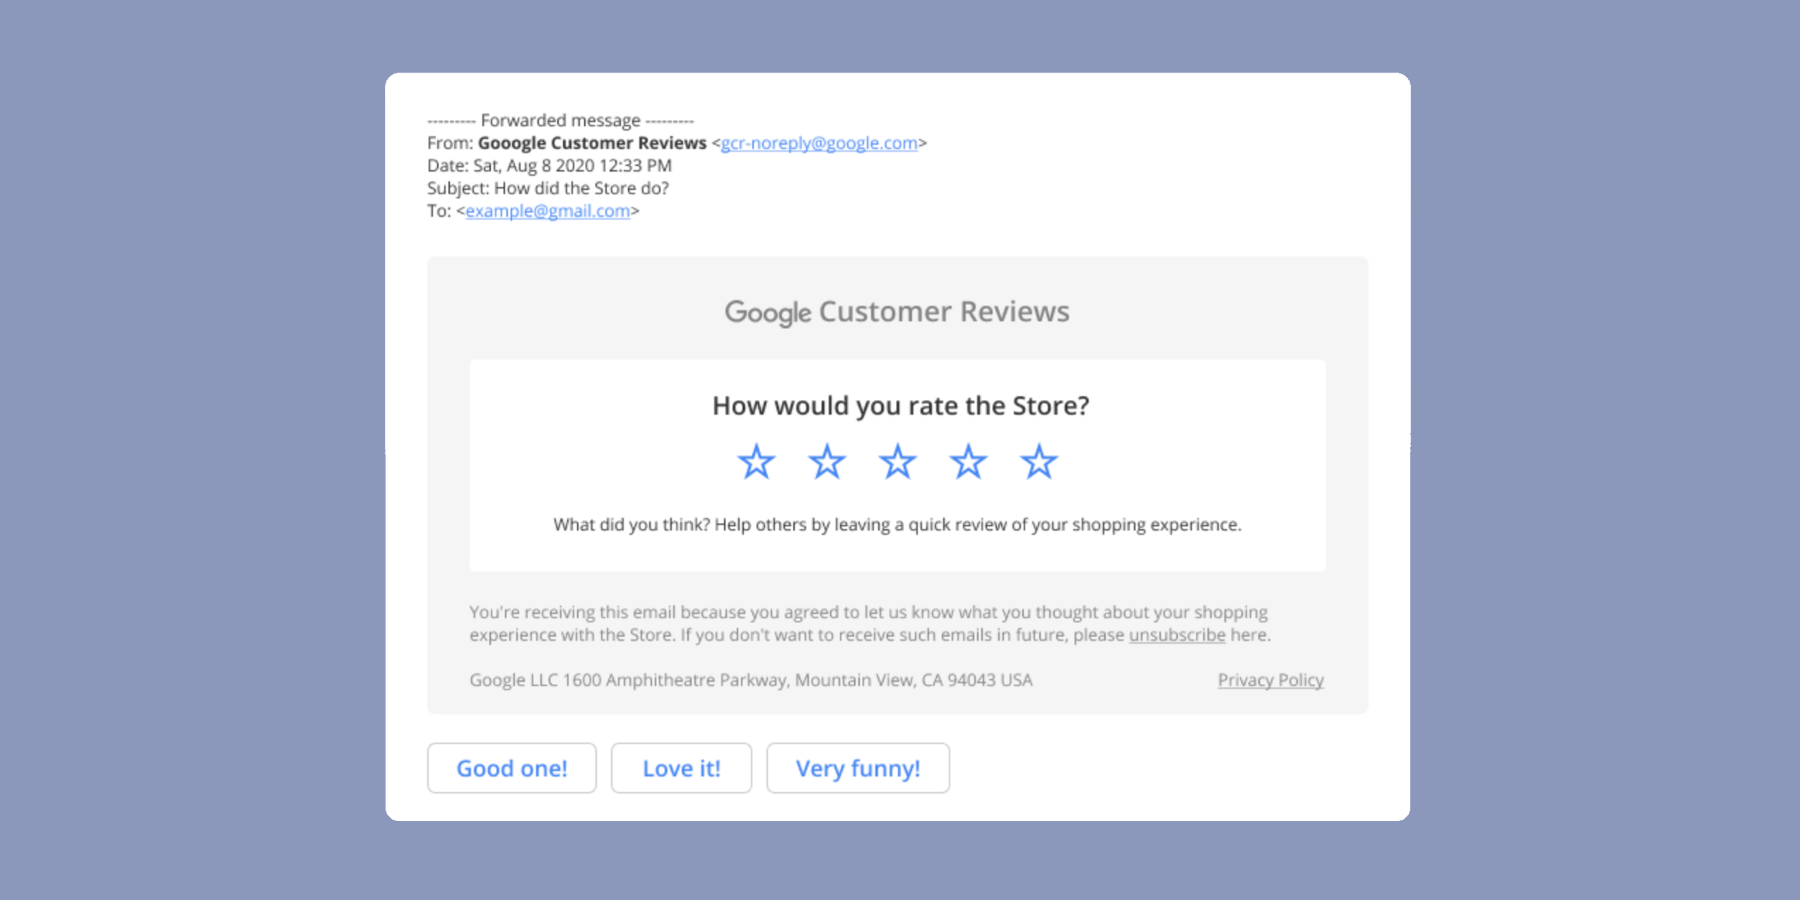 M2 Google Customer Reviews